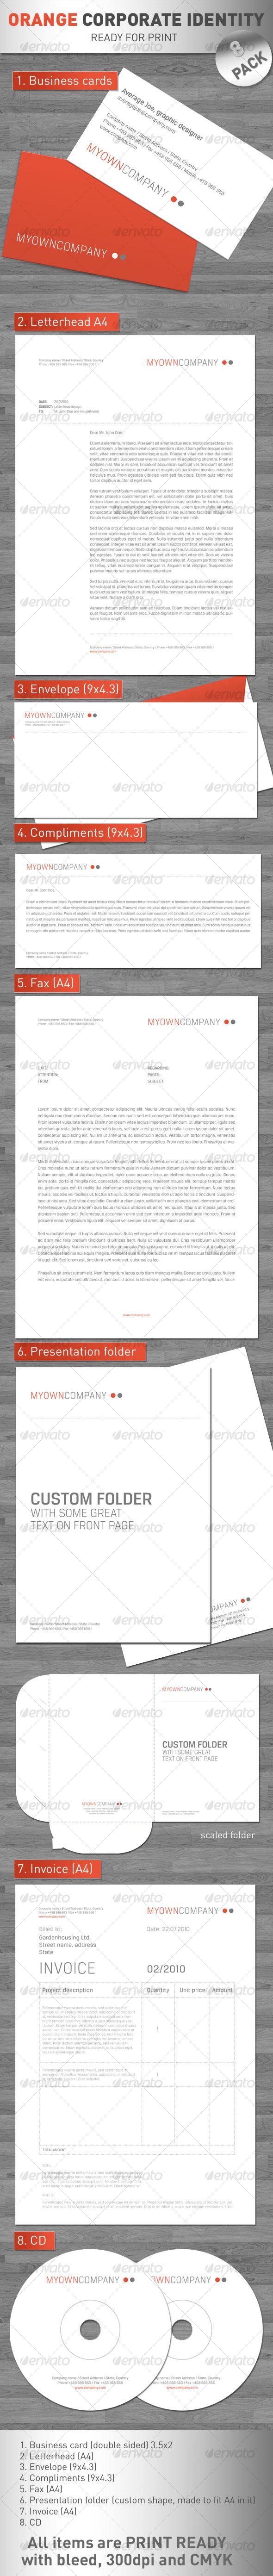 Orange Coporate Identity - 8 PACK !!! - Stationery Print Templates